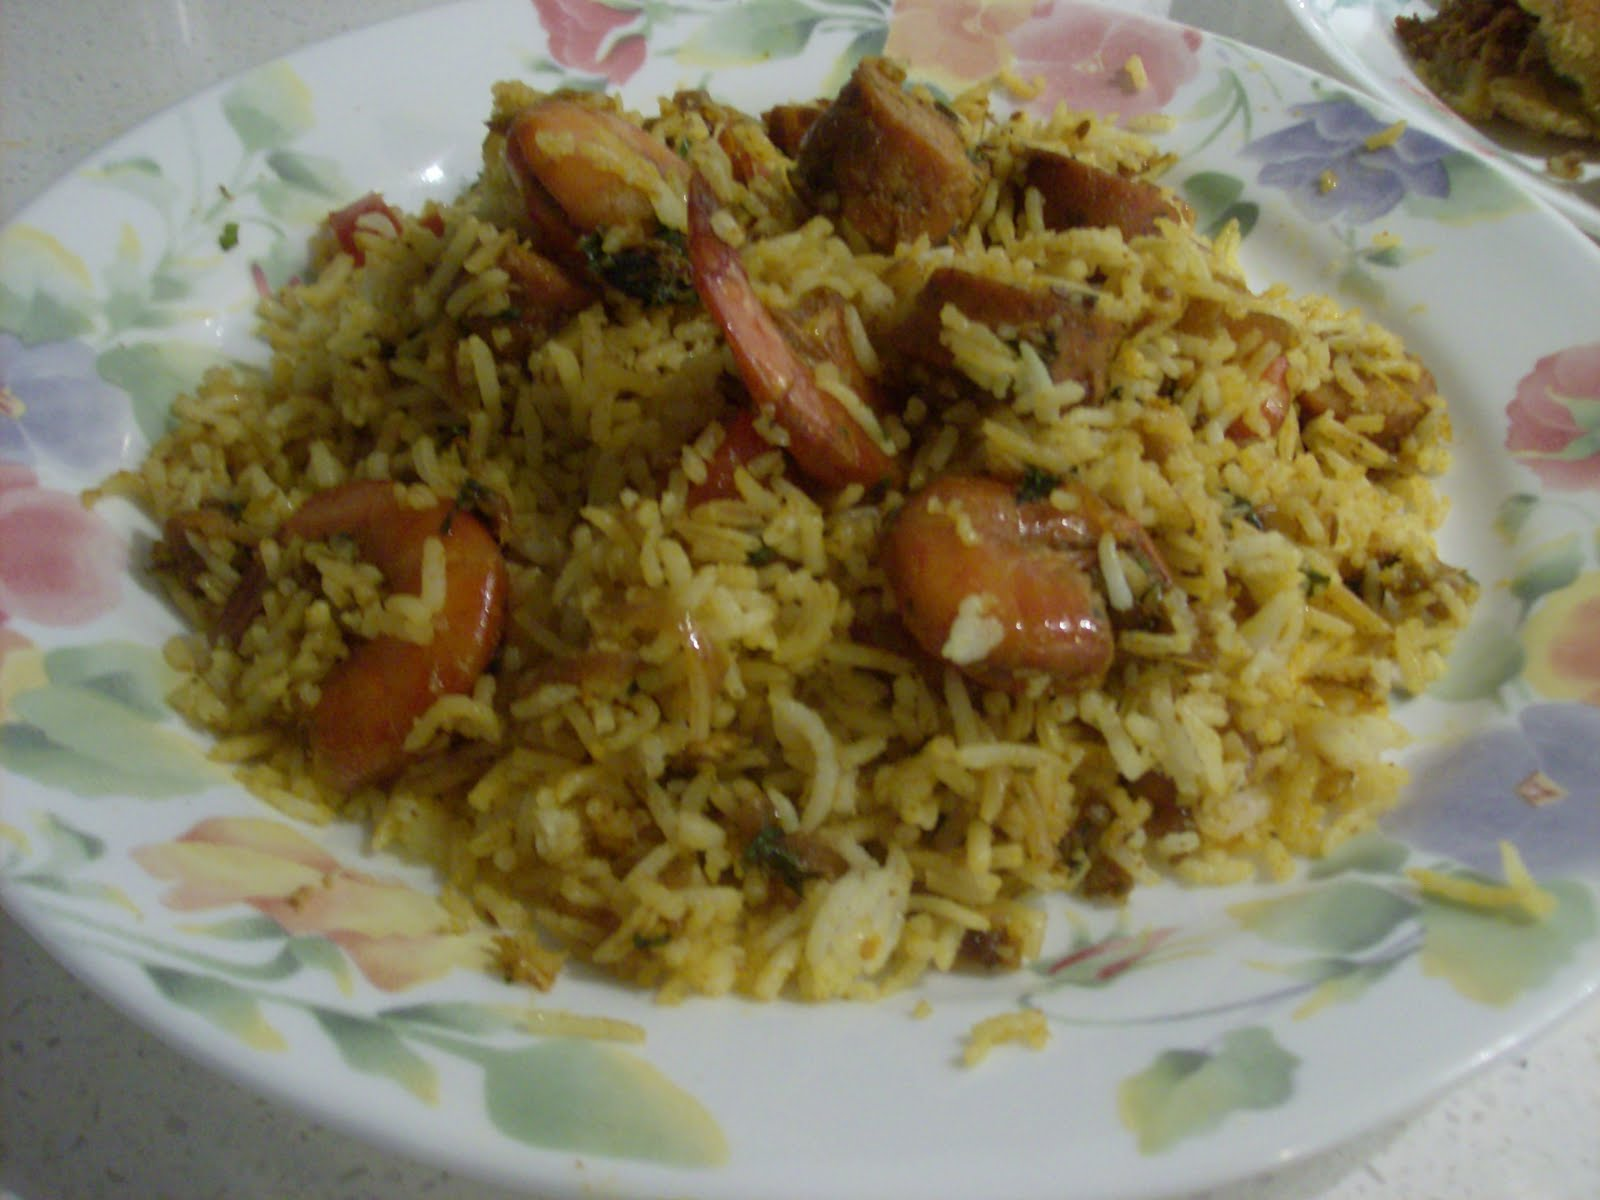 video of how to make sausage and shrimp jambalya